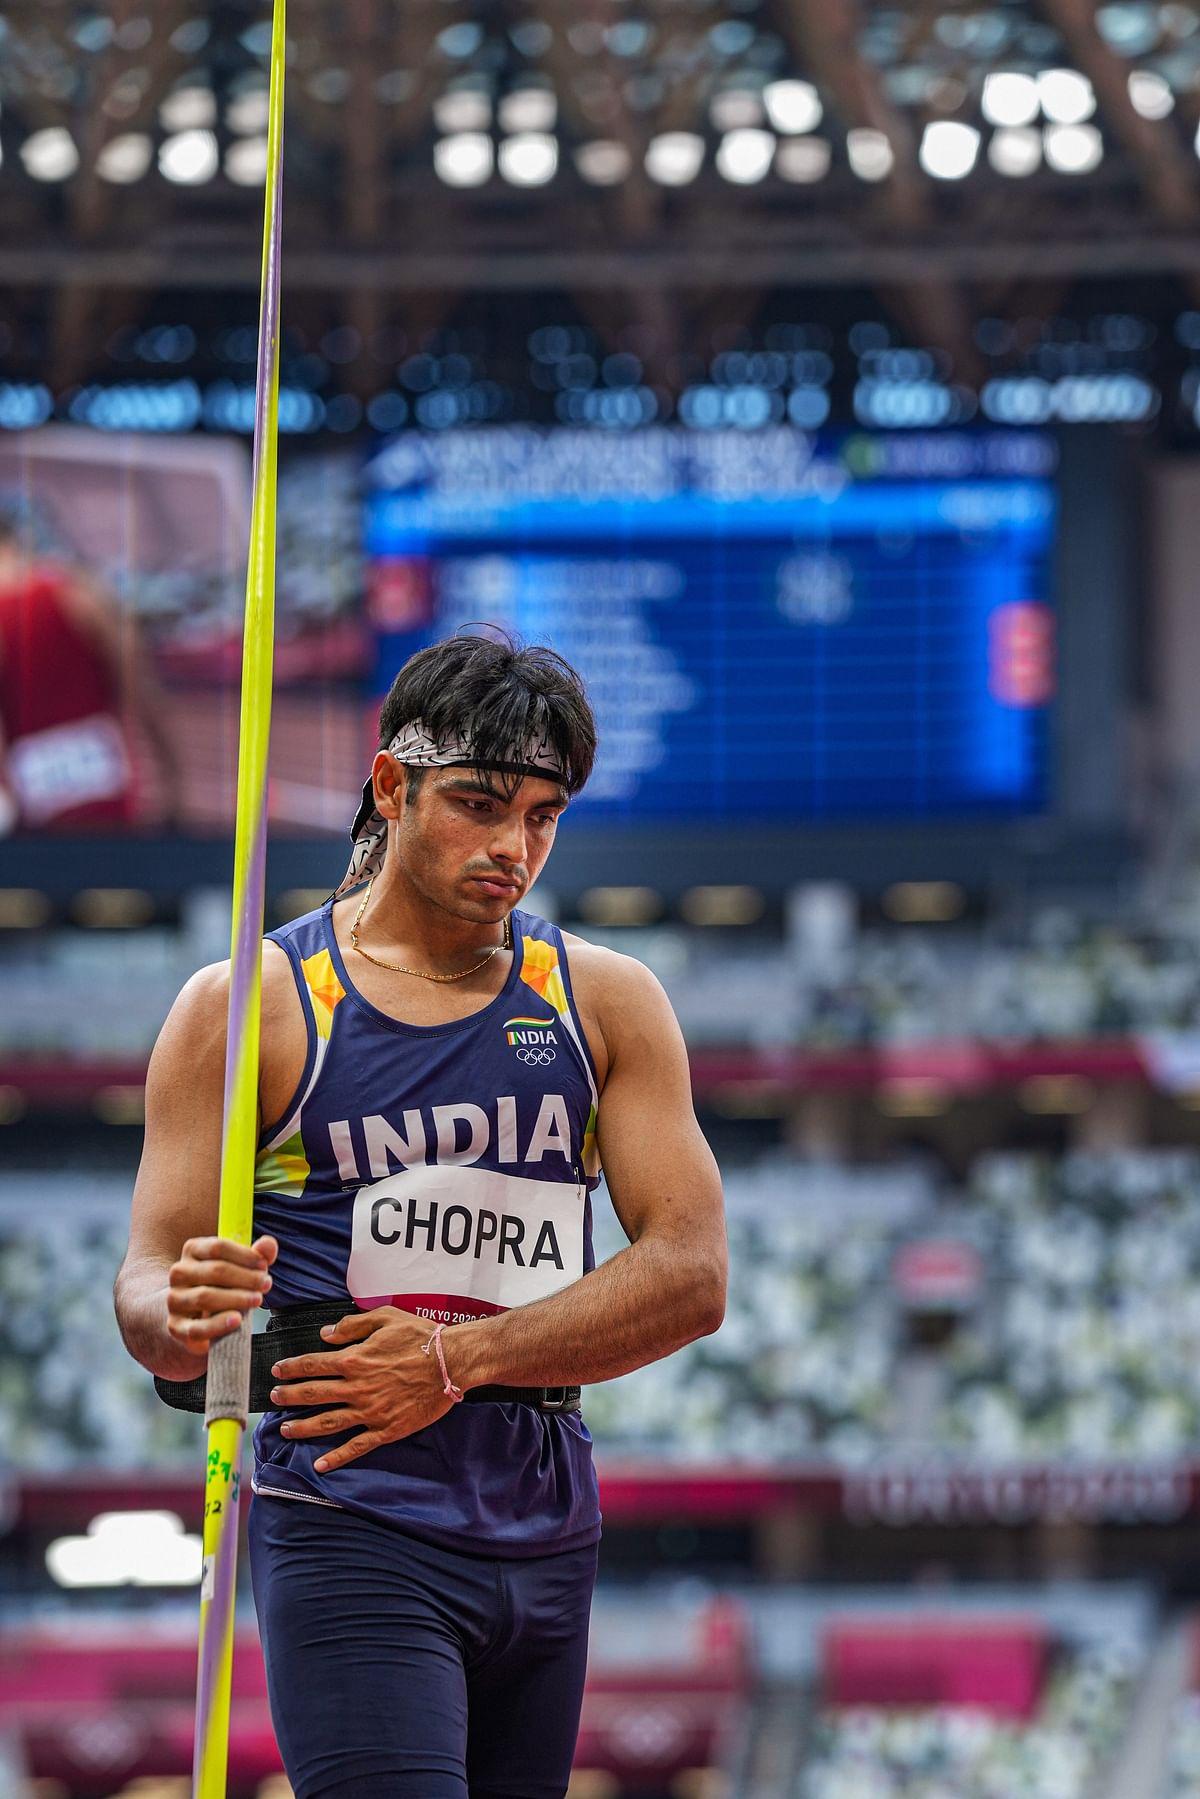 Neeraj raises medal hopes